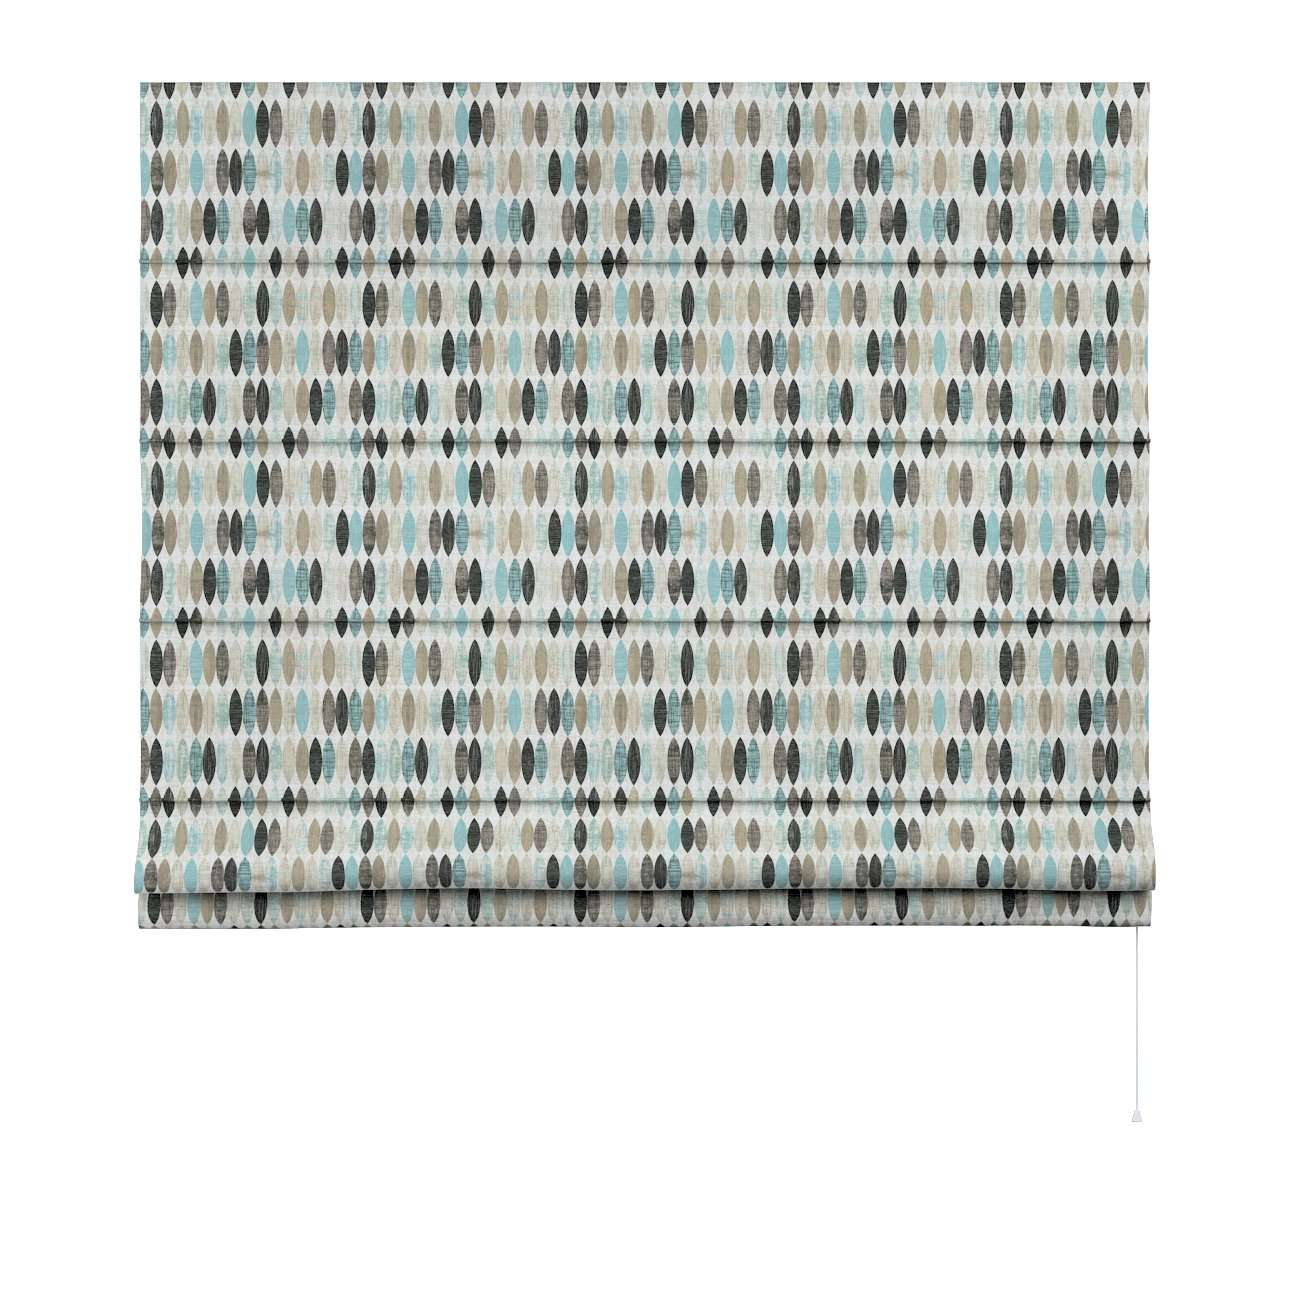 Roleta rzymska Capri w kolekcji Modern, tkanina: 141-91